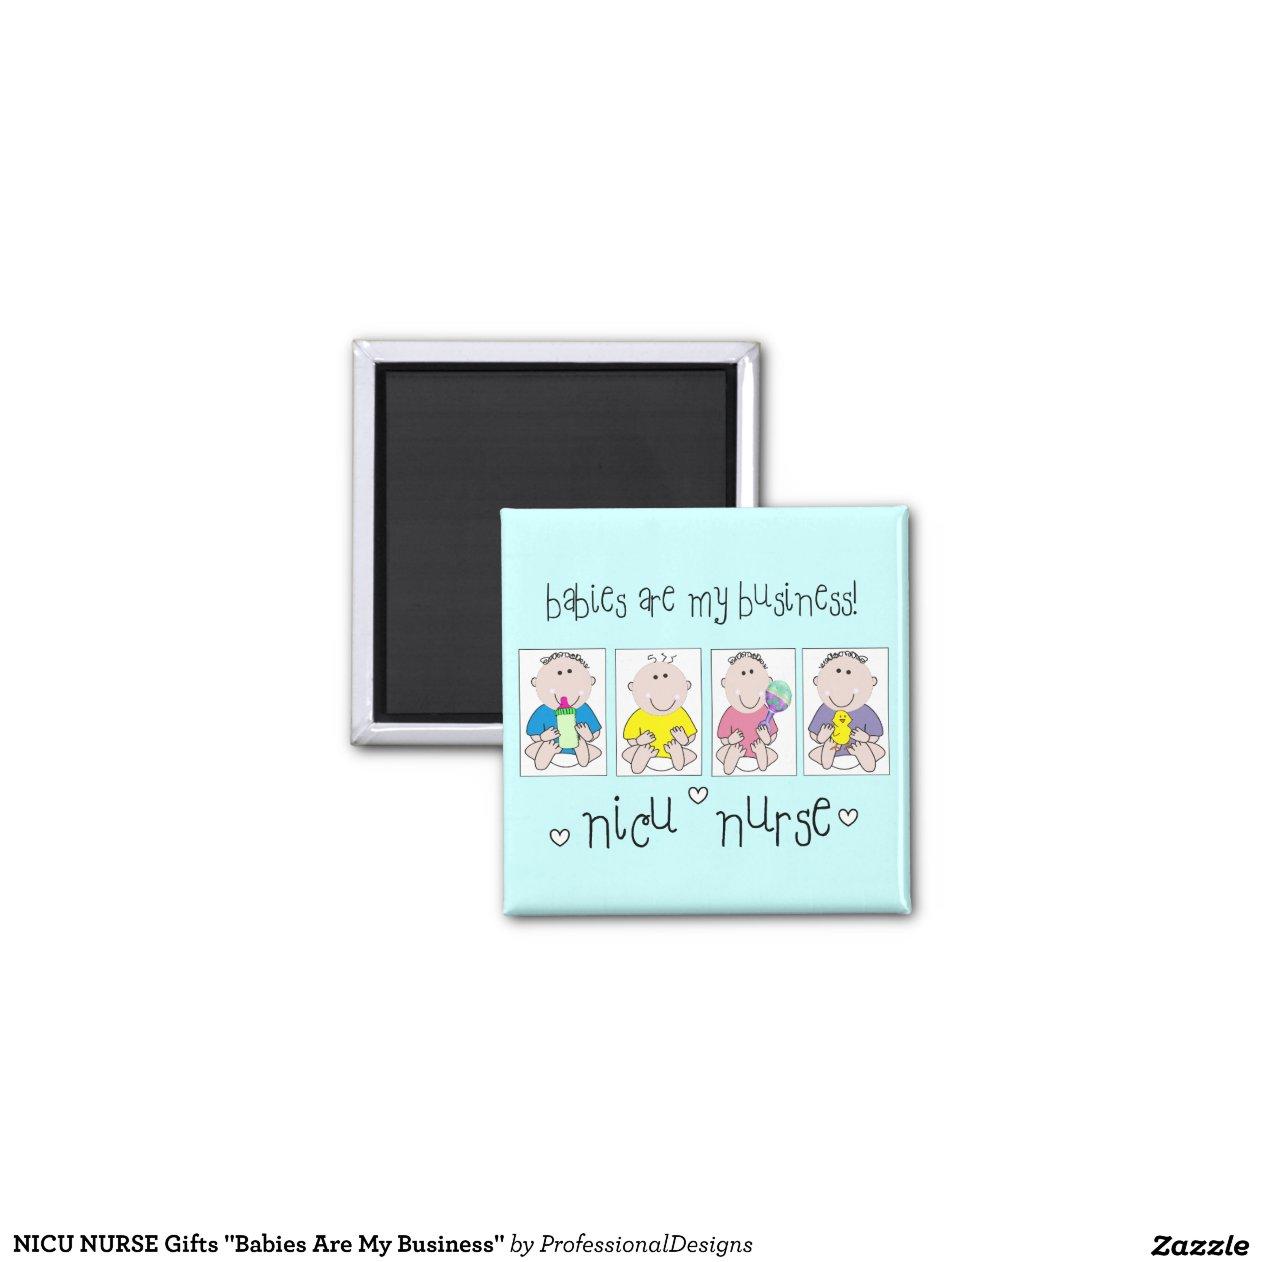 "NICU NURSE Gifts ""Babies Are My Business"" | Zazzle"